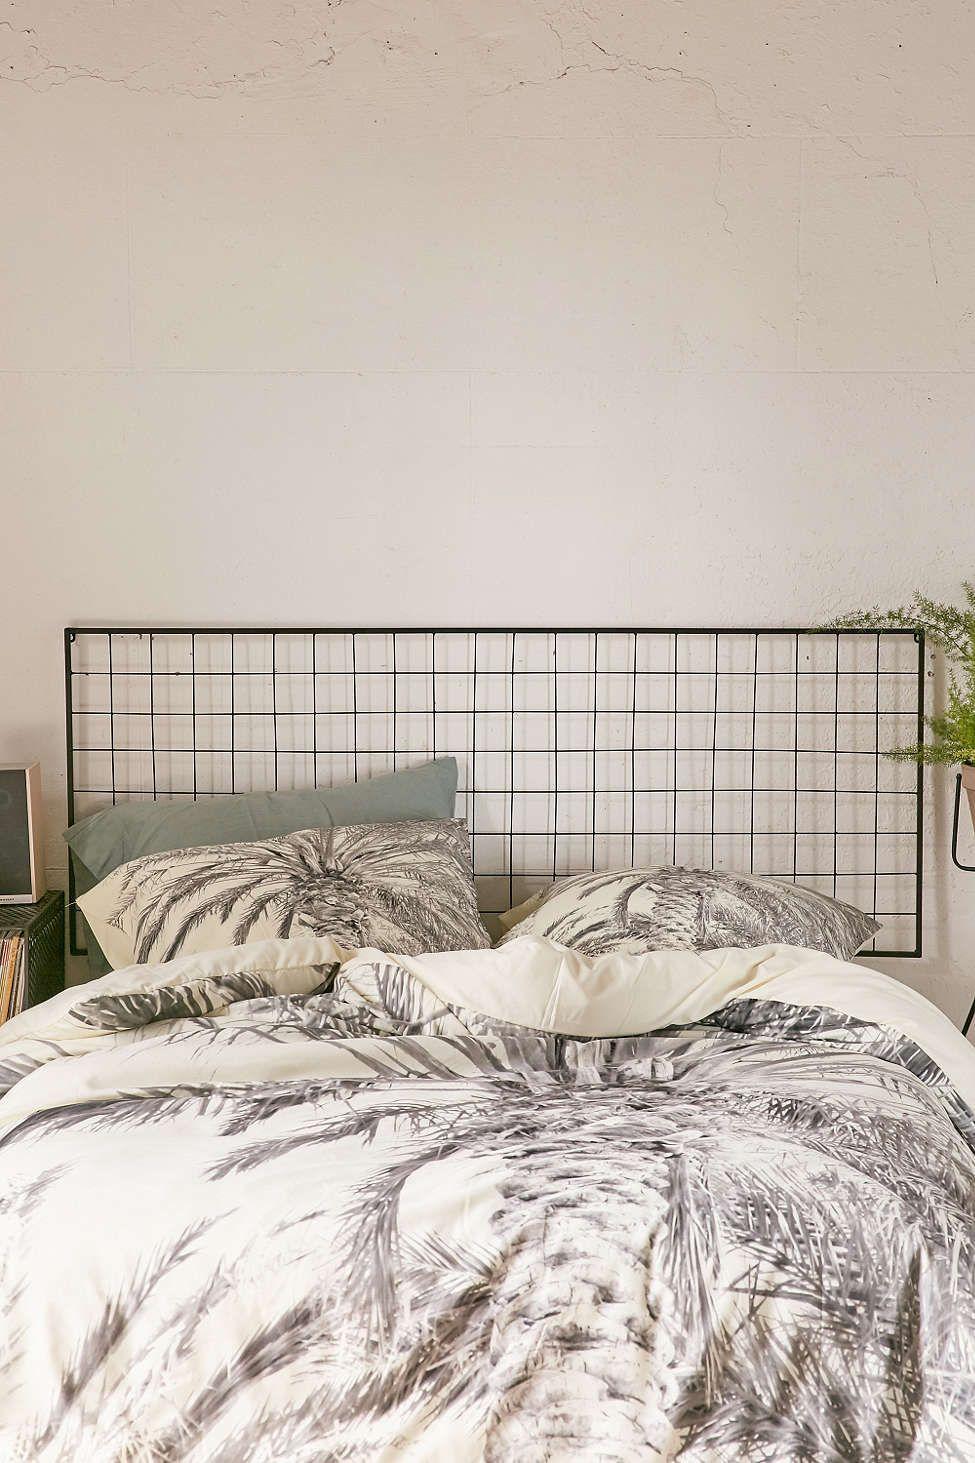 Master bedroom headboard  URBAN OUTFITTERS Grid Metal Headboard  Home Deco  Pinterest